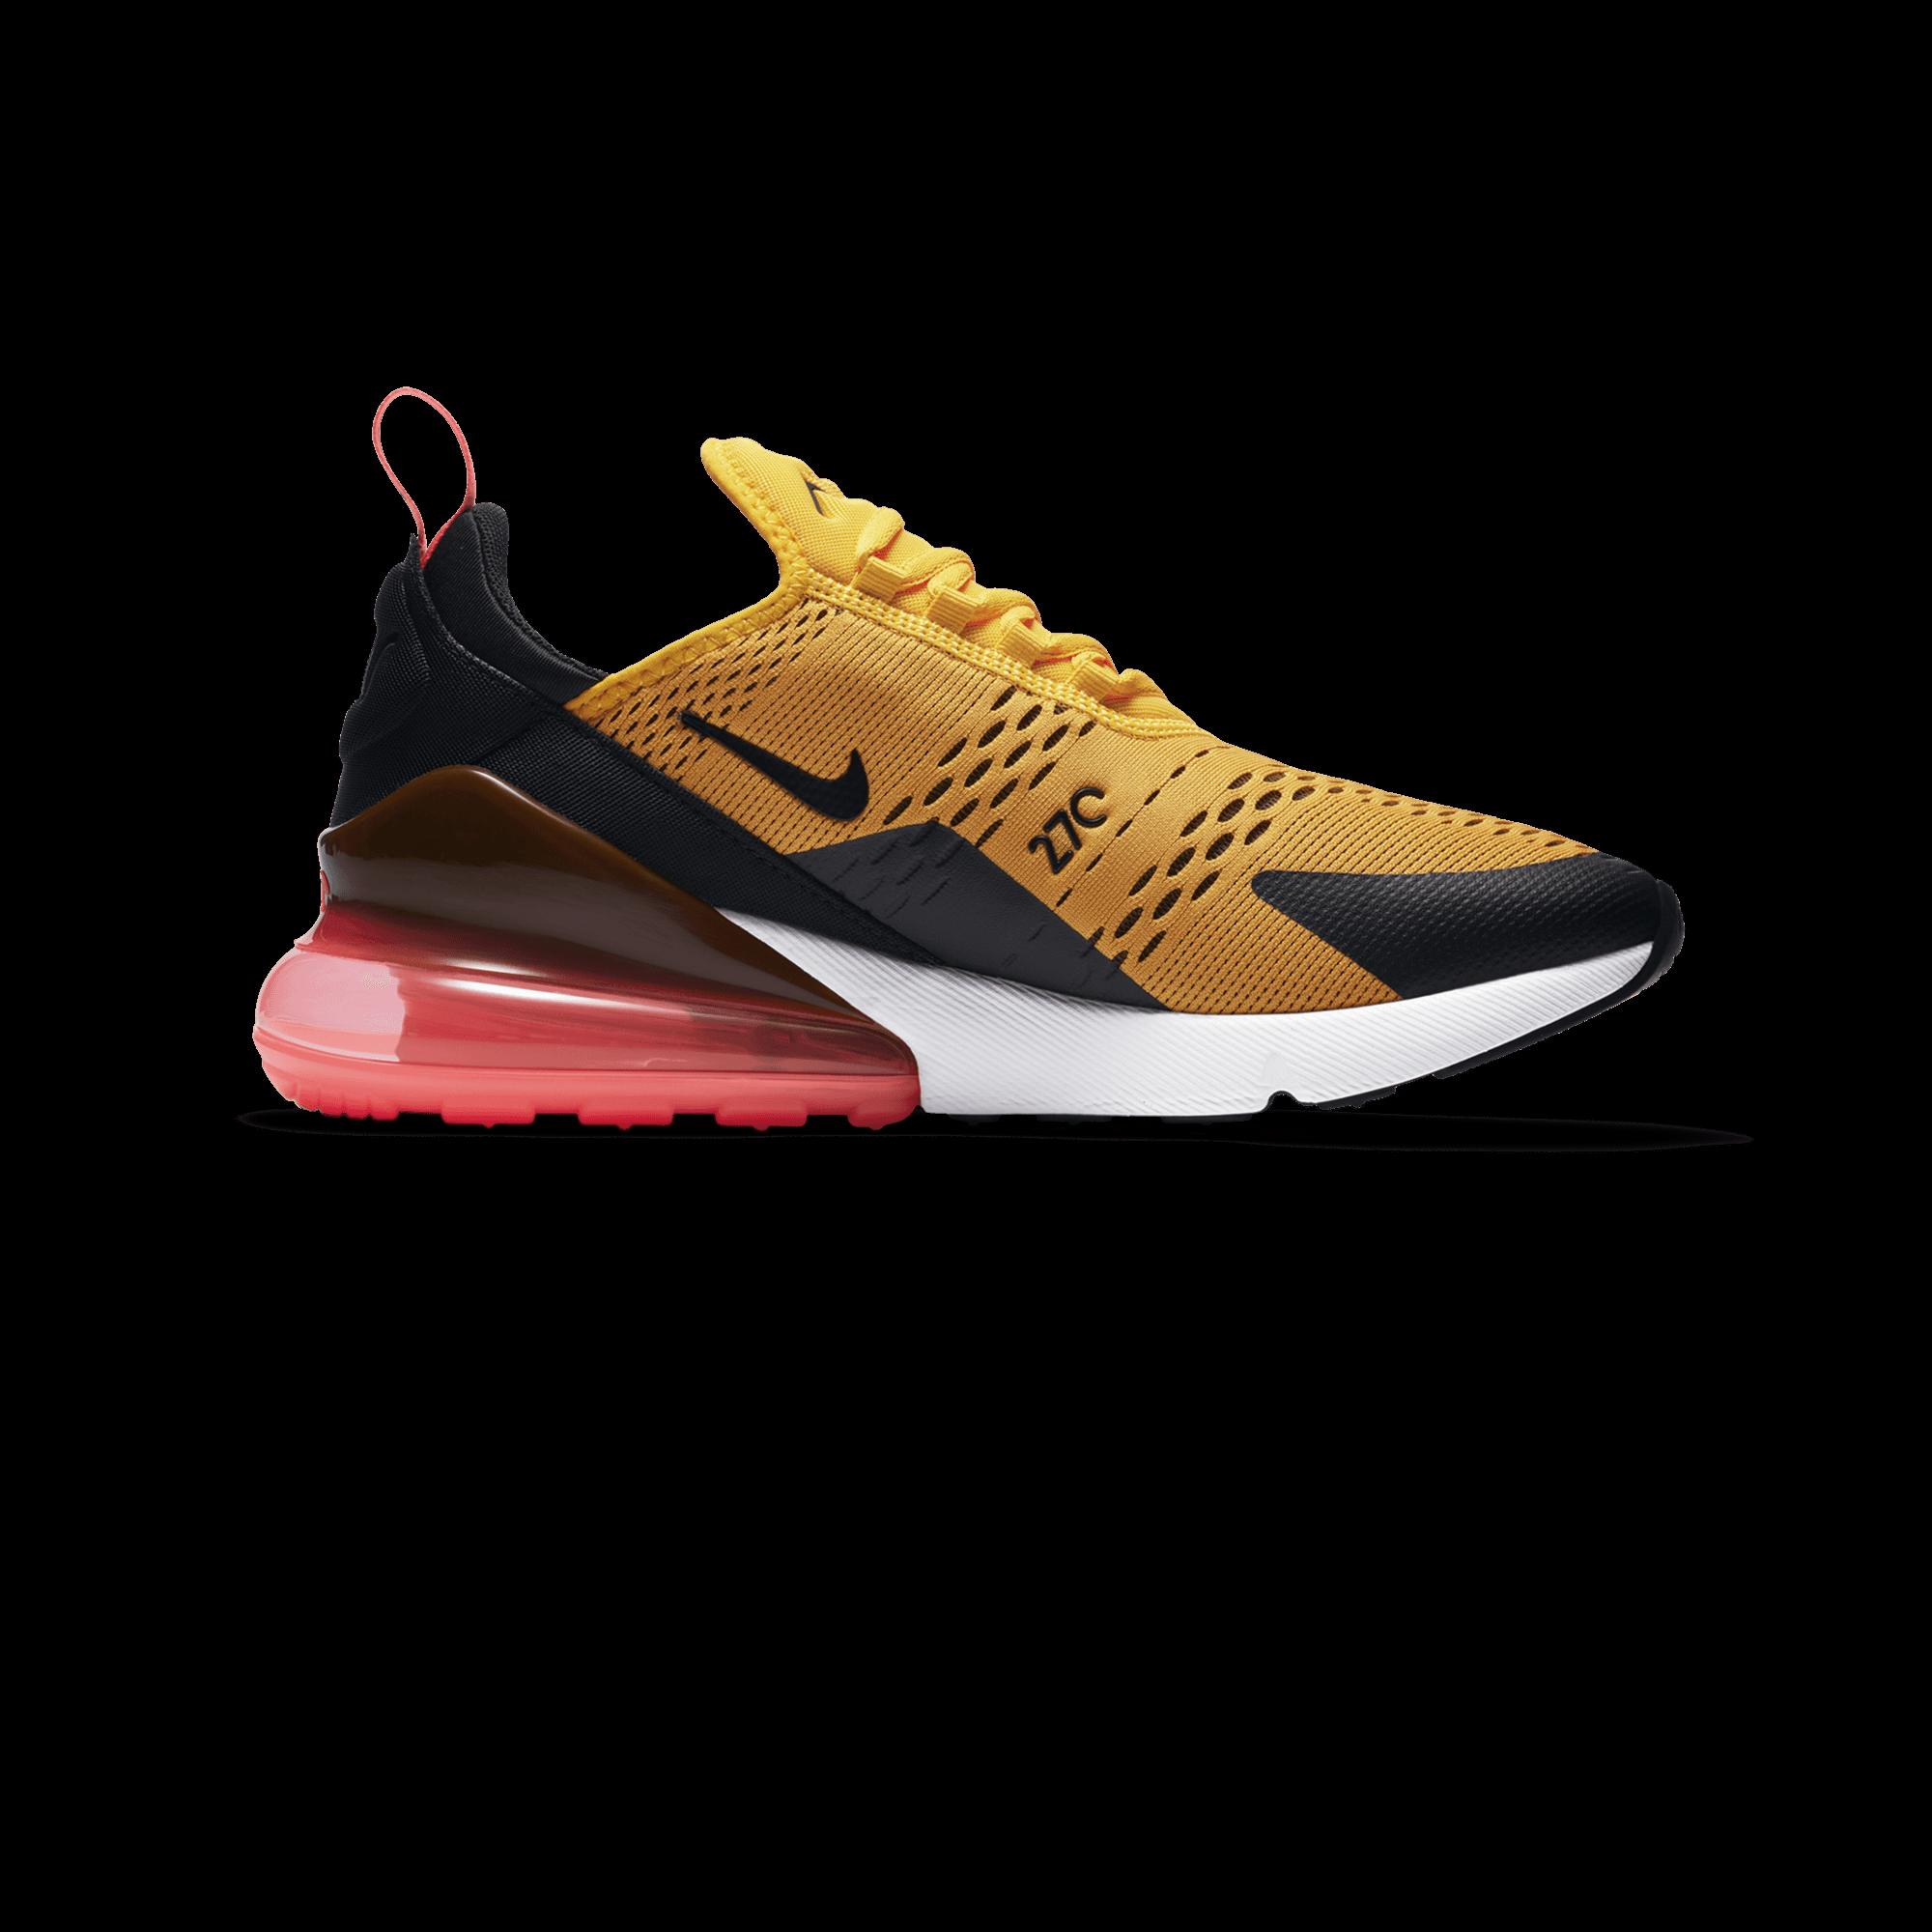 Nike Air Max 270 uomo